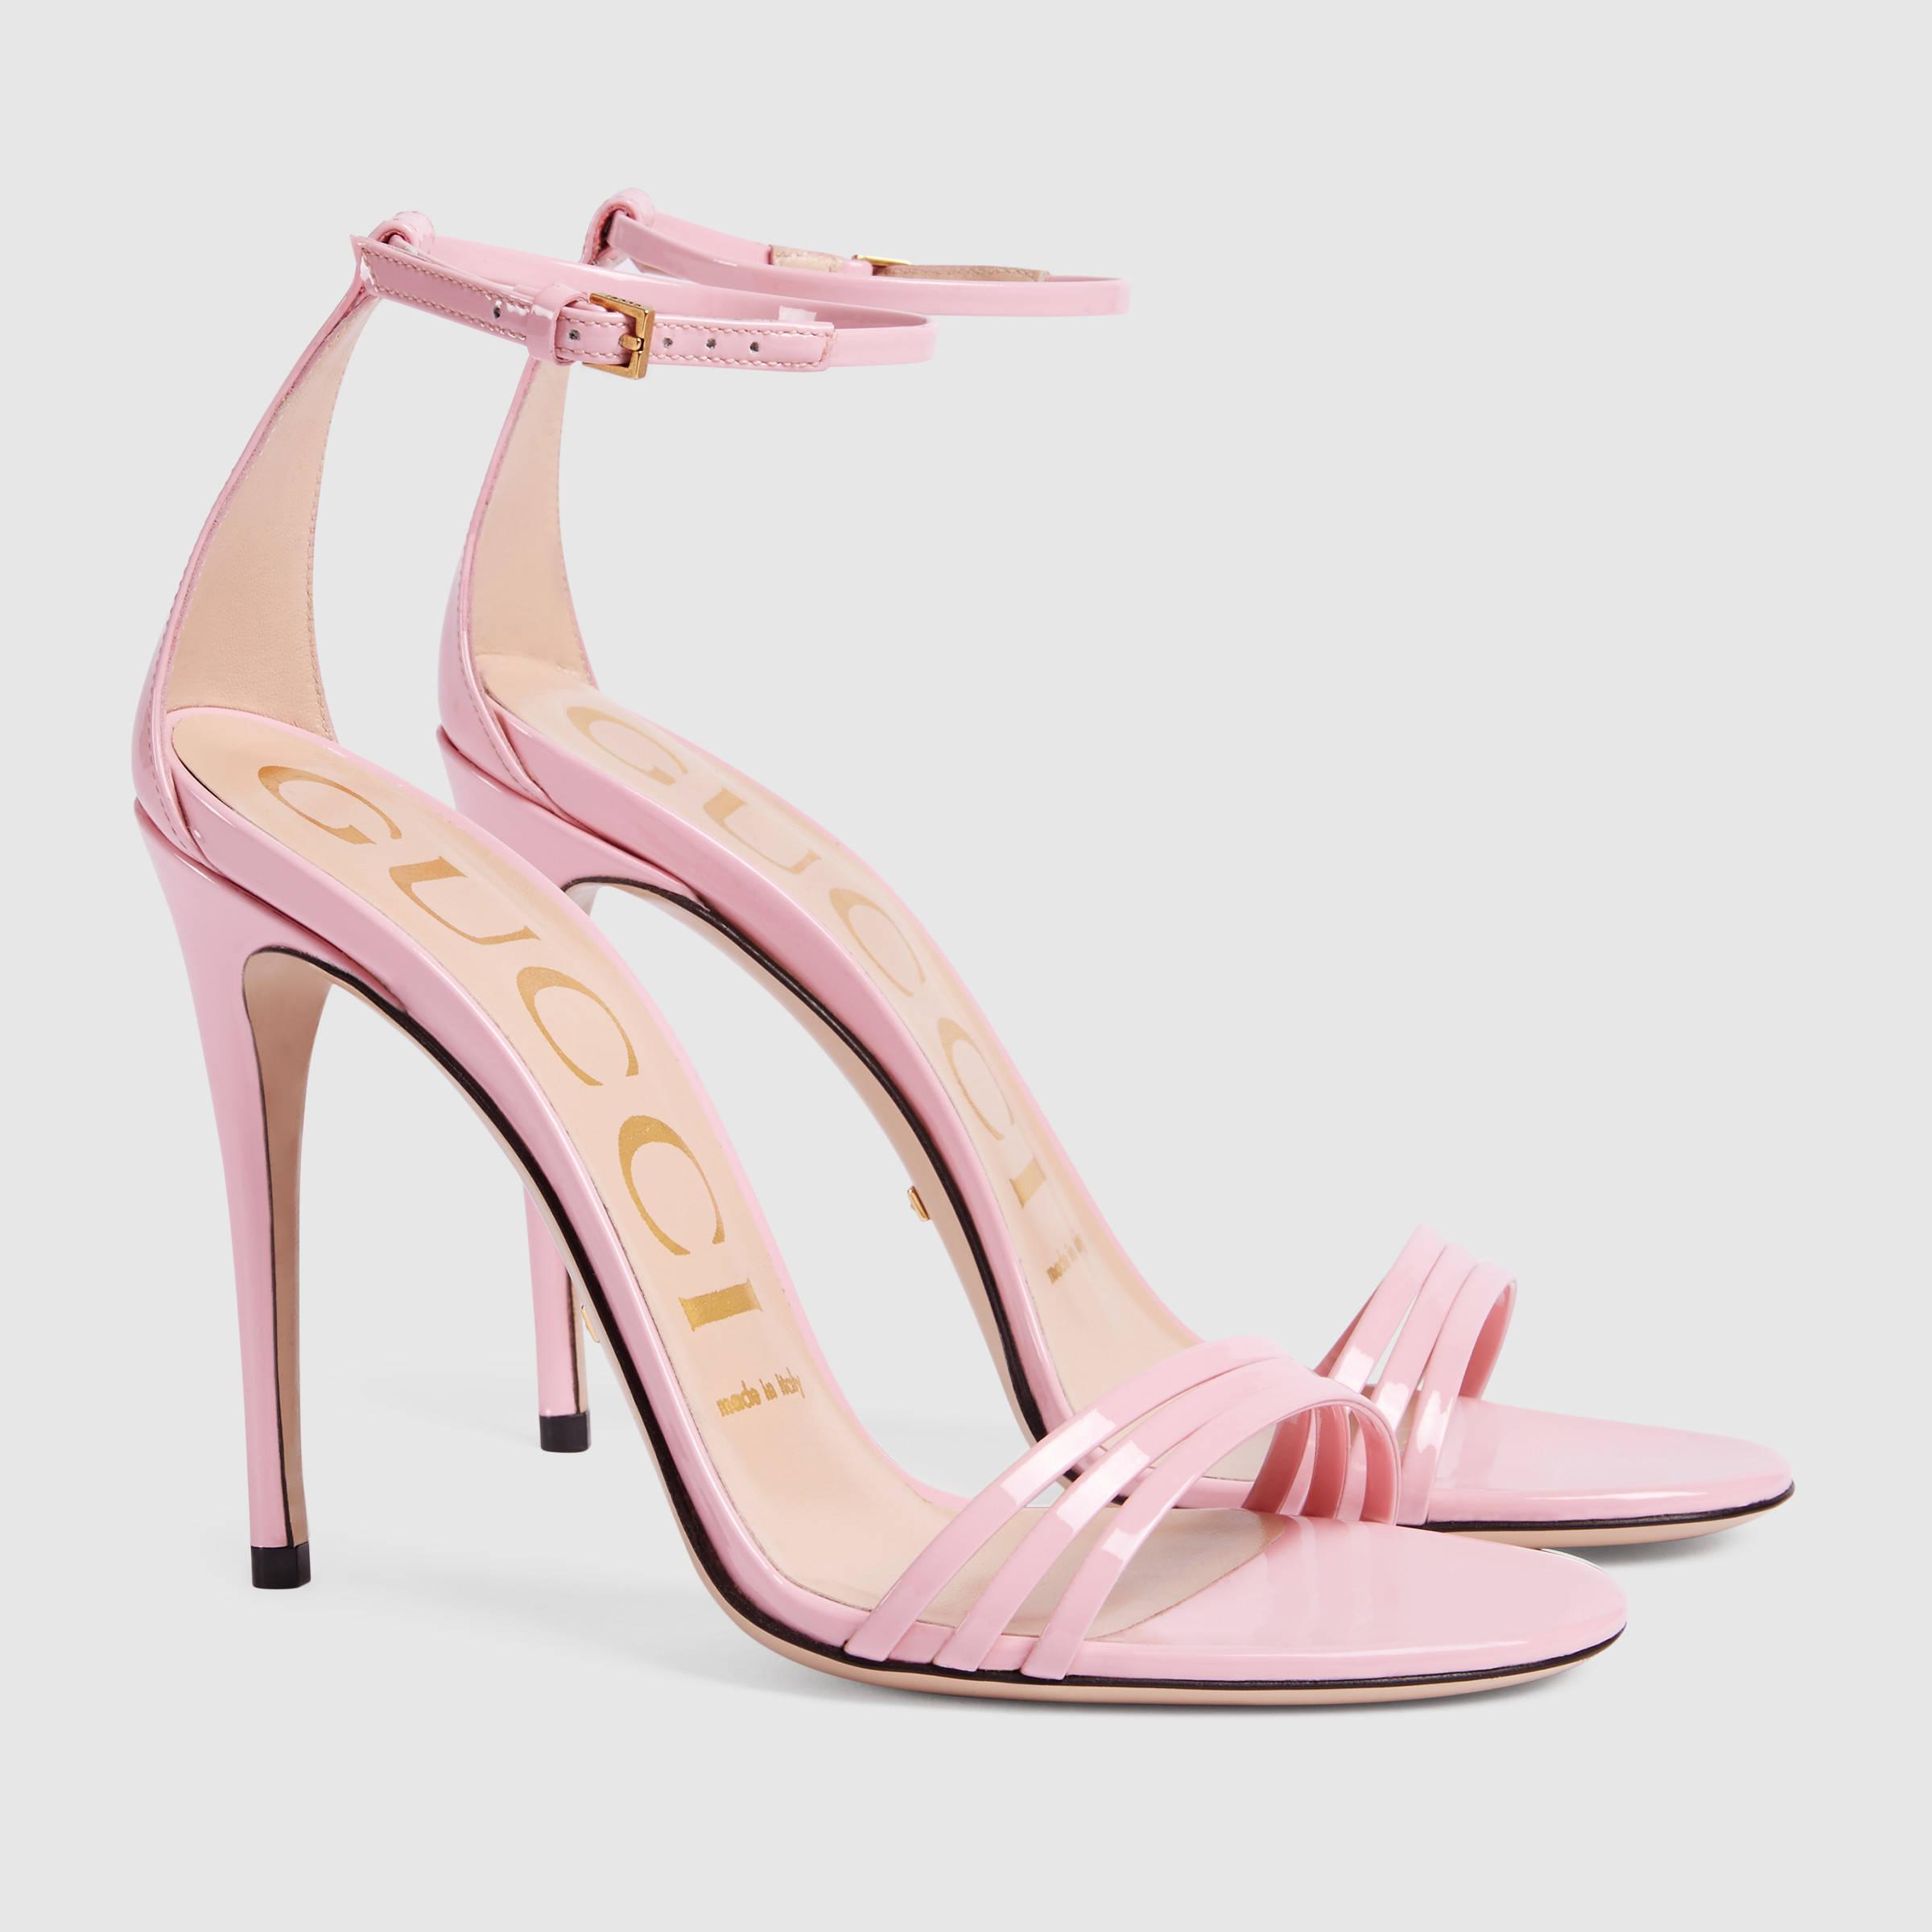 db88b7d127b Women's Pink Patent Leather Sandal